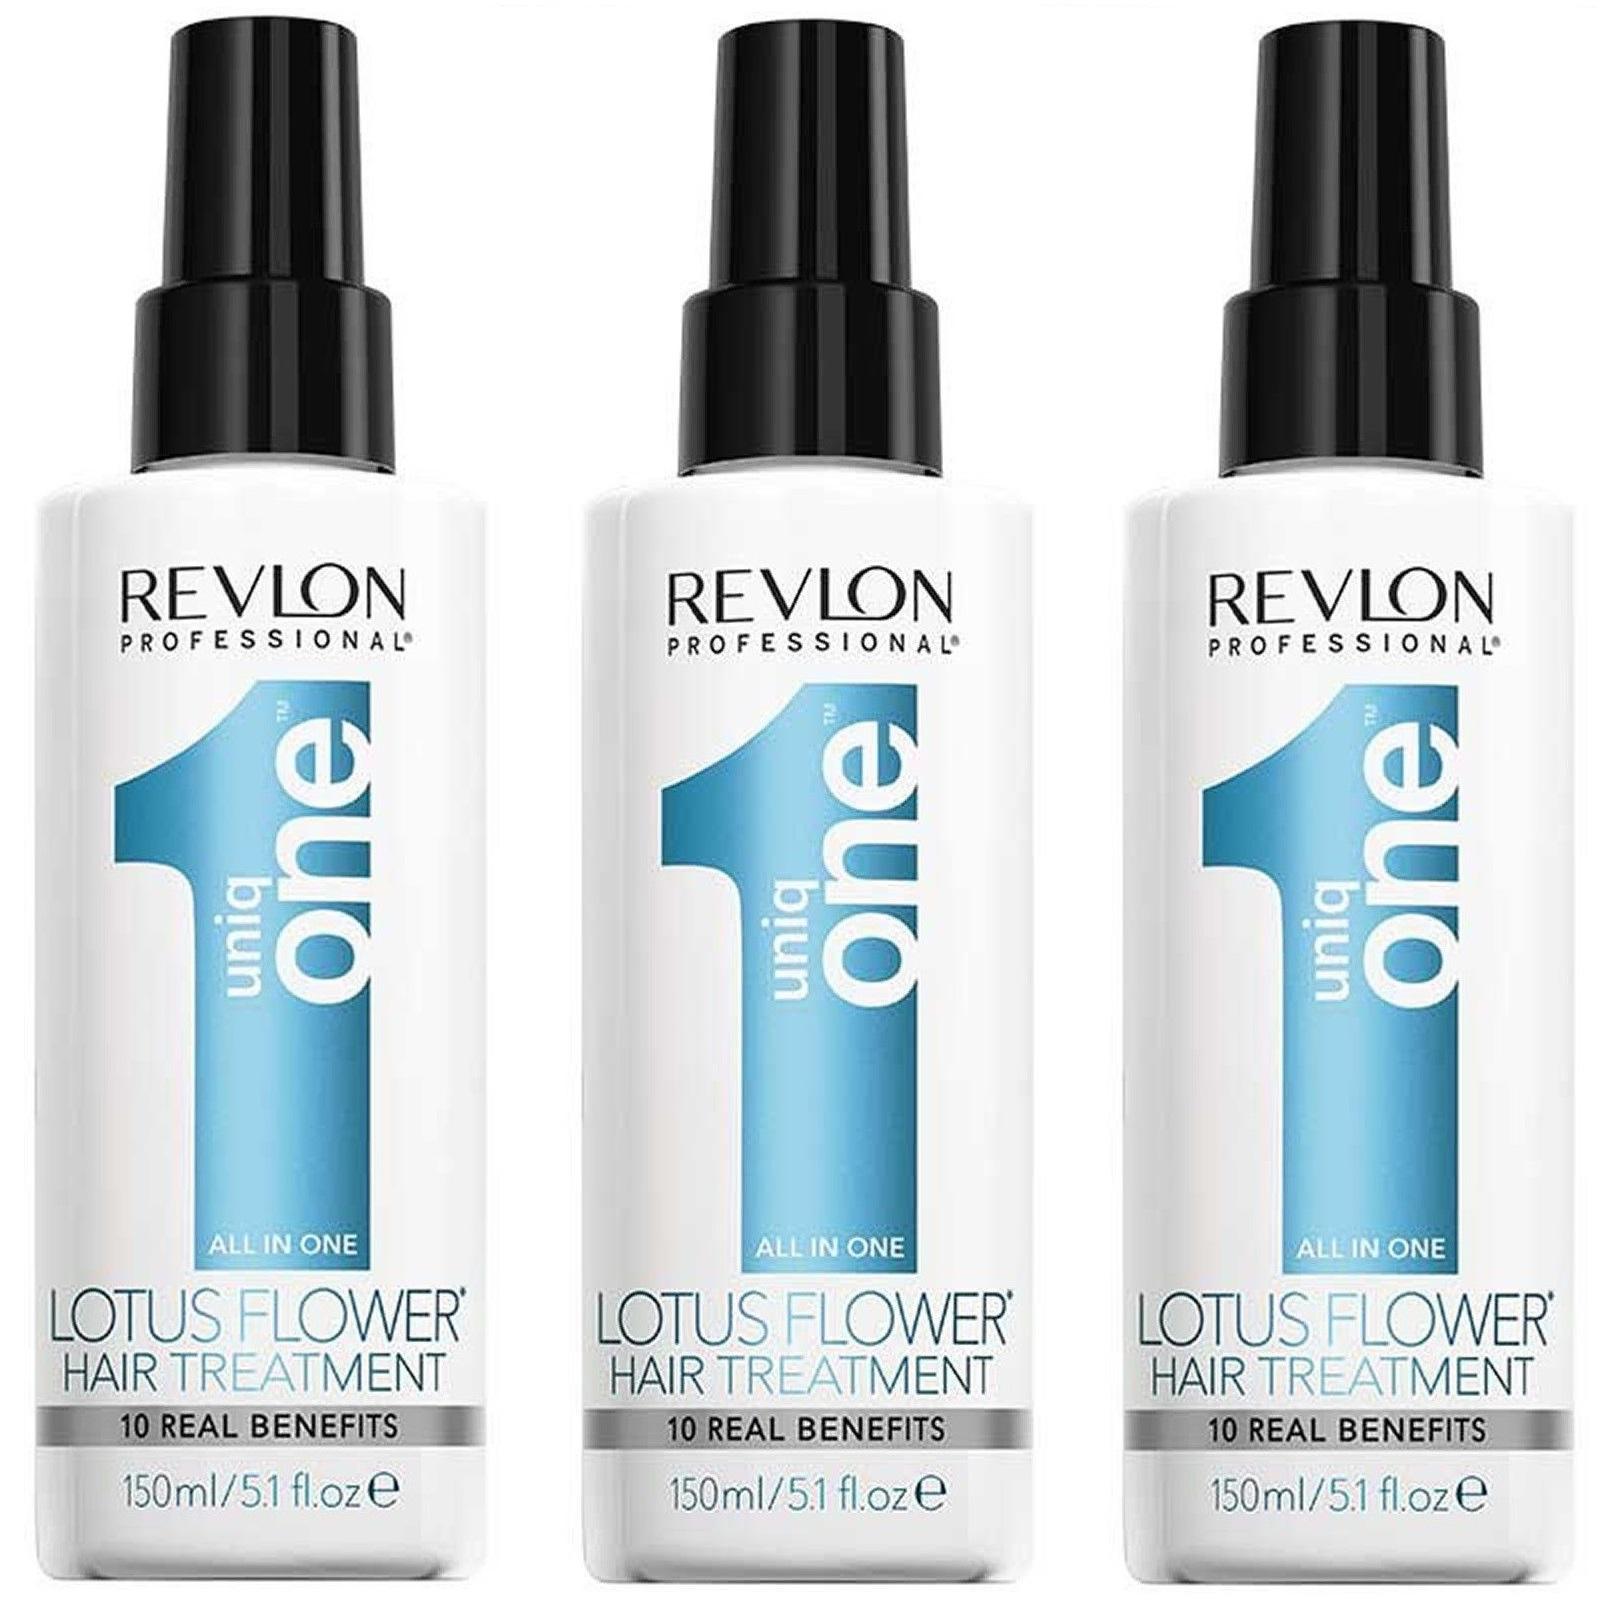 Uniq One - 3x All in One Flower Hair Treatment 150 ml